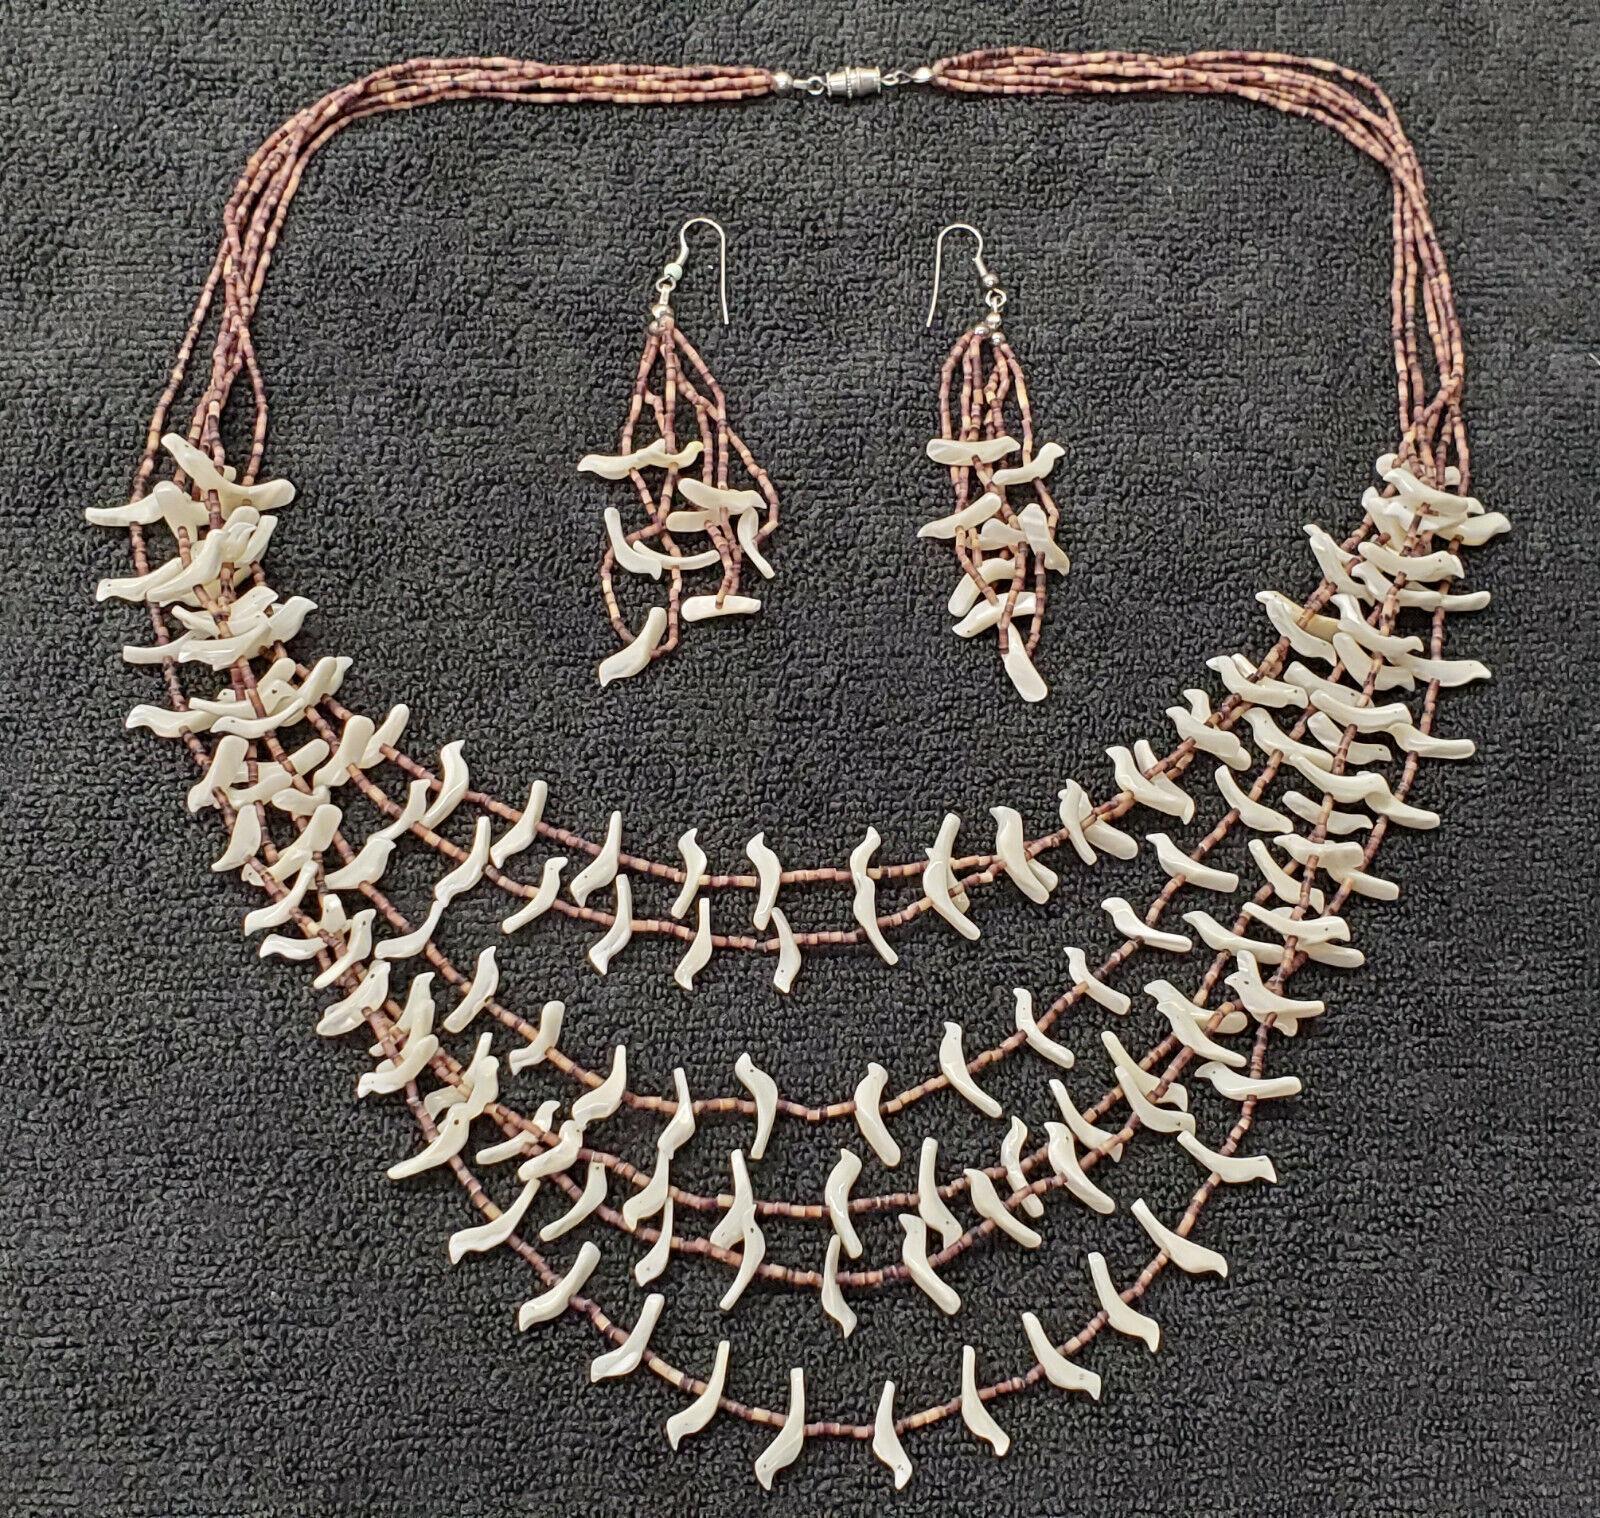 Vintage nativo americano joyas Zuni Fetiche De Concha De Perla Collar Aretes Aves